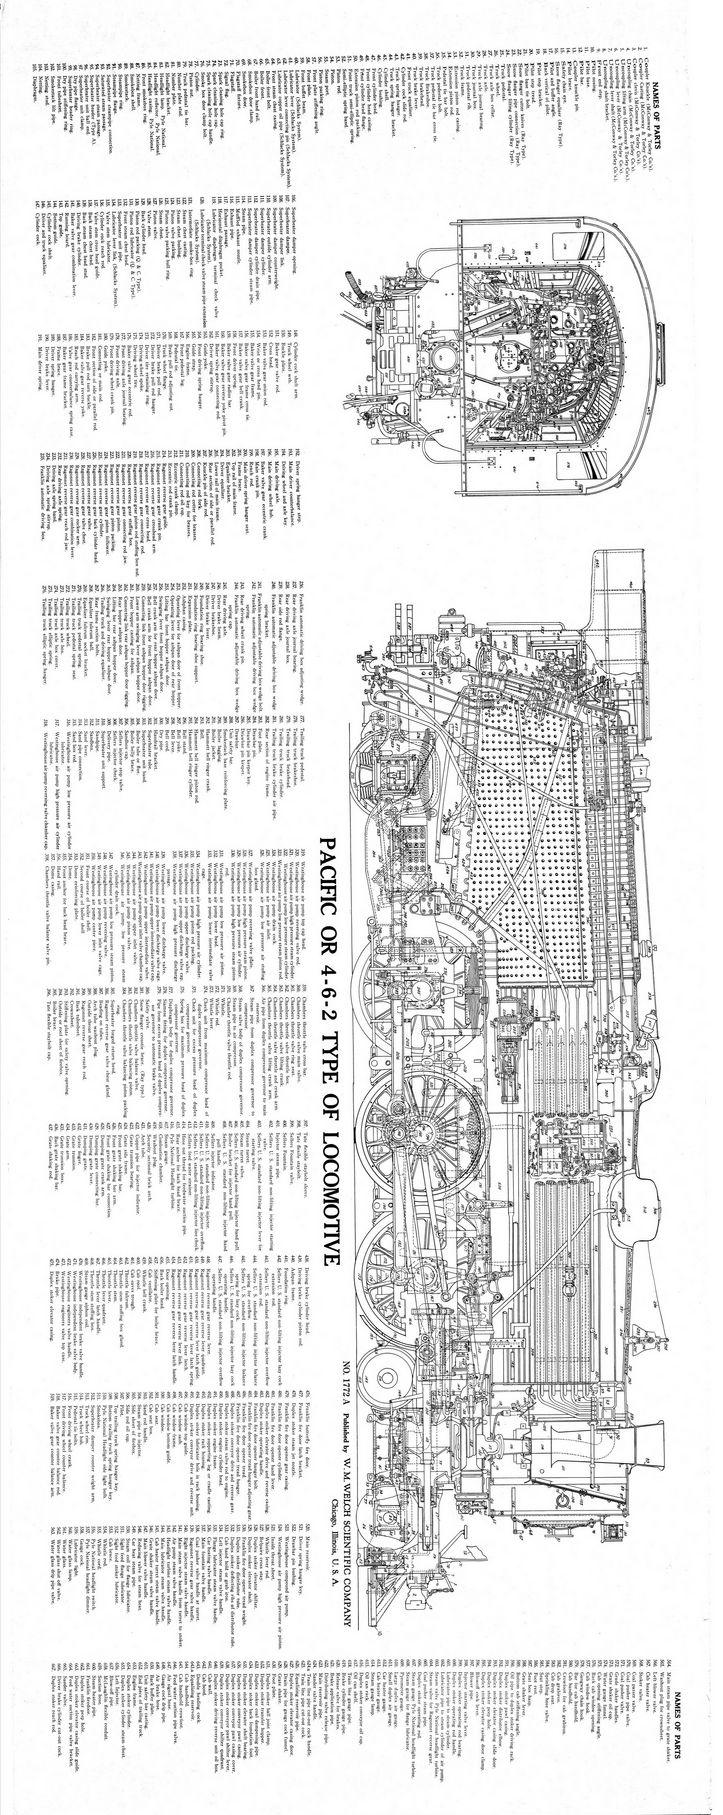 A Fine Locomotive Schematic, 1928 | Null Entropy Locomotive Schematic on crane schematics, machine schematics, electrical schematics, space schematics, computer schematics, forklift schematics, vehicle schematics, motorcycle schematics, clock schematics,